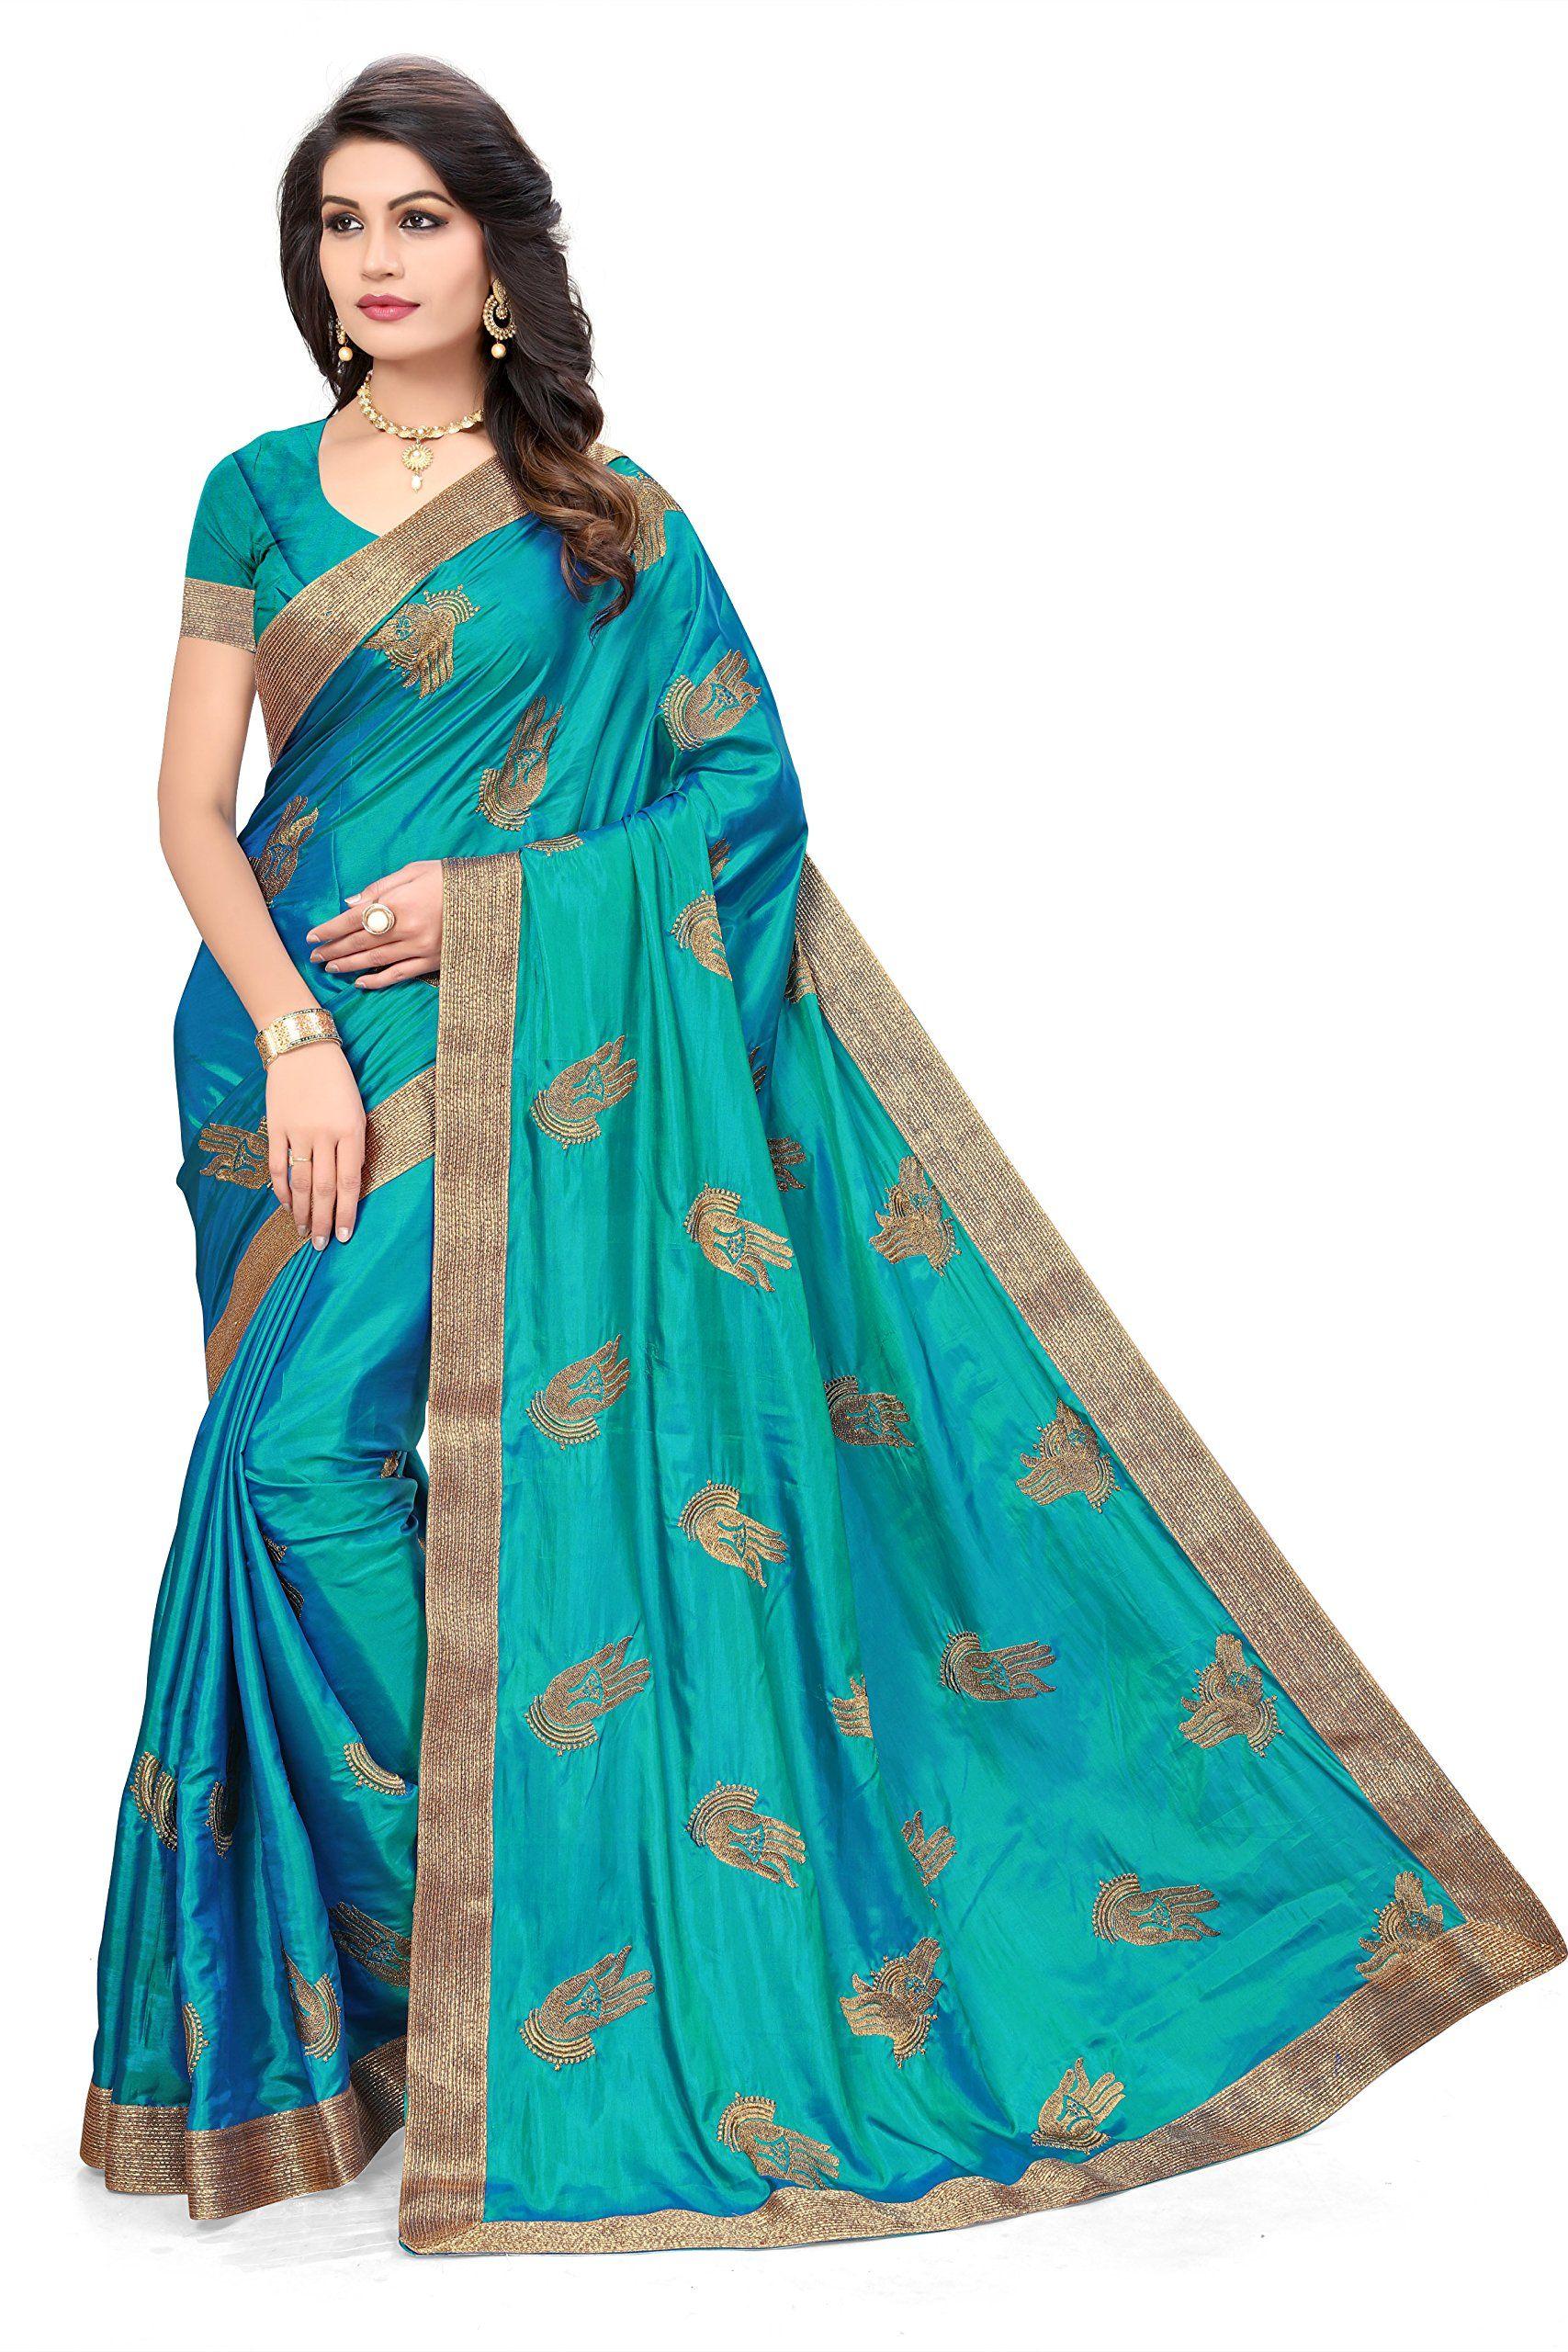 29c52c16264c18 Colour: BlueFabric : paper silk hand pattern embroidred work sareeLength  (Mtr) : Saree - 5.5 Mtr | Blouse - 0.8 Mtr